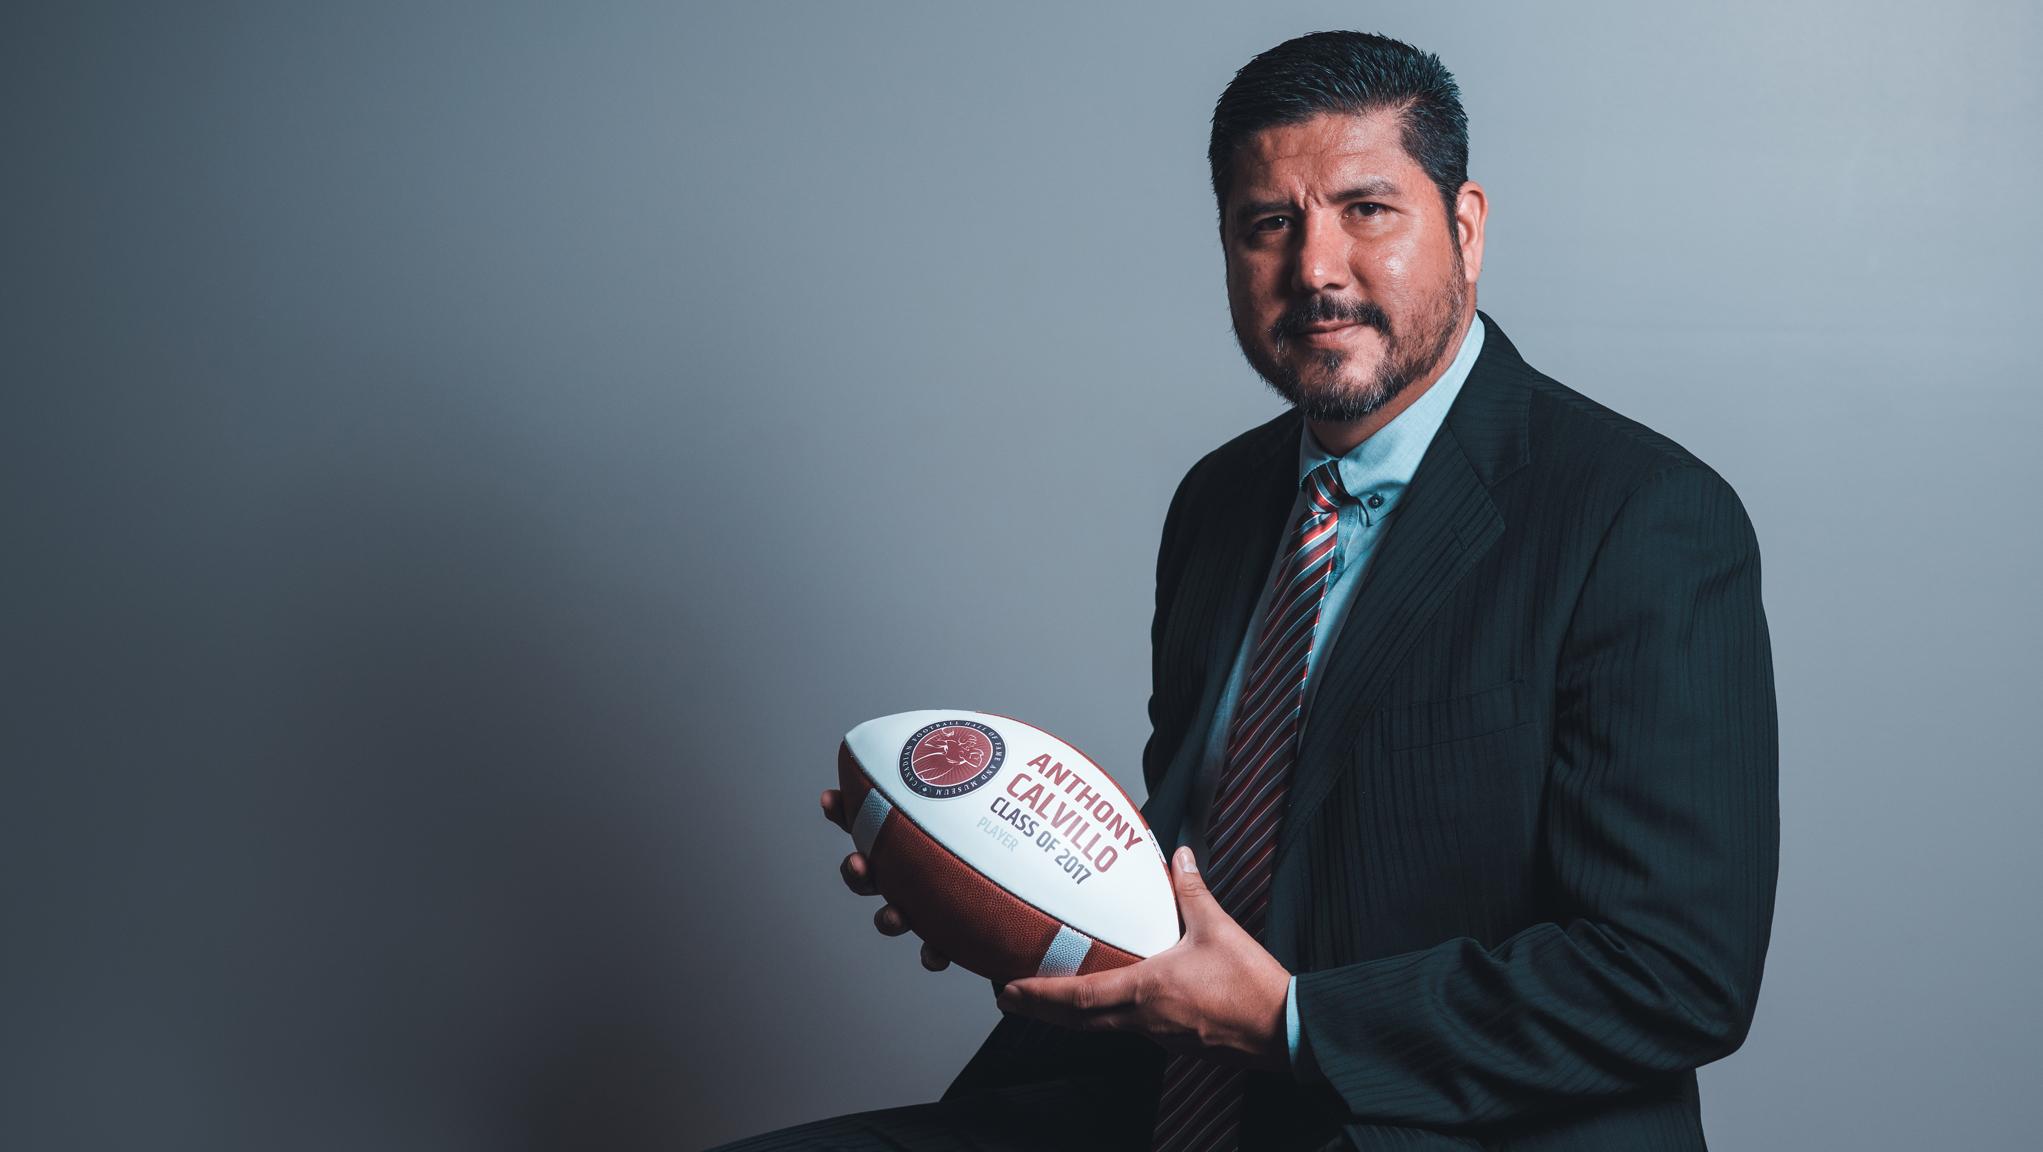 HOF Profile: Calvillo was the ultimate underdog story